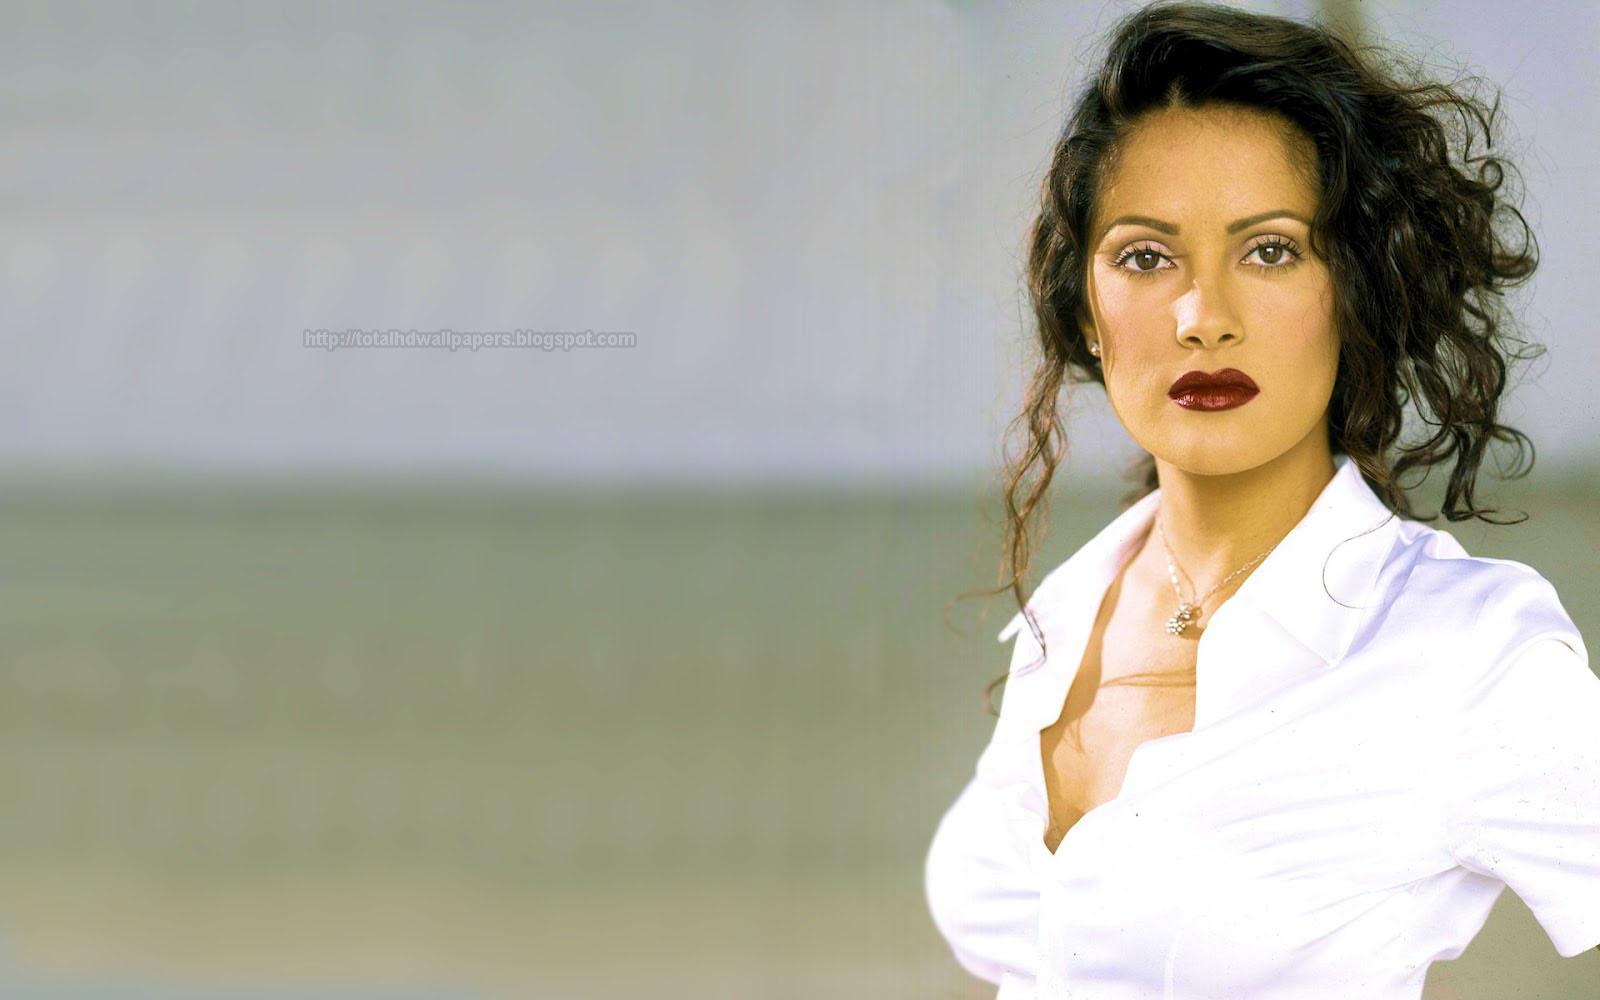 Katrina Kaif Hd Wallpapers 1080p